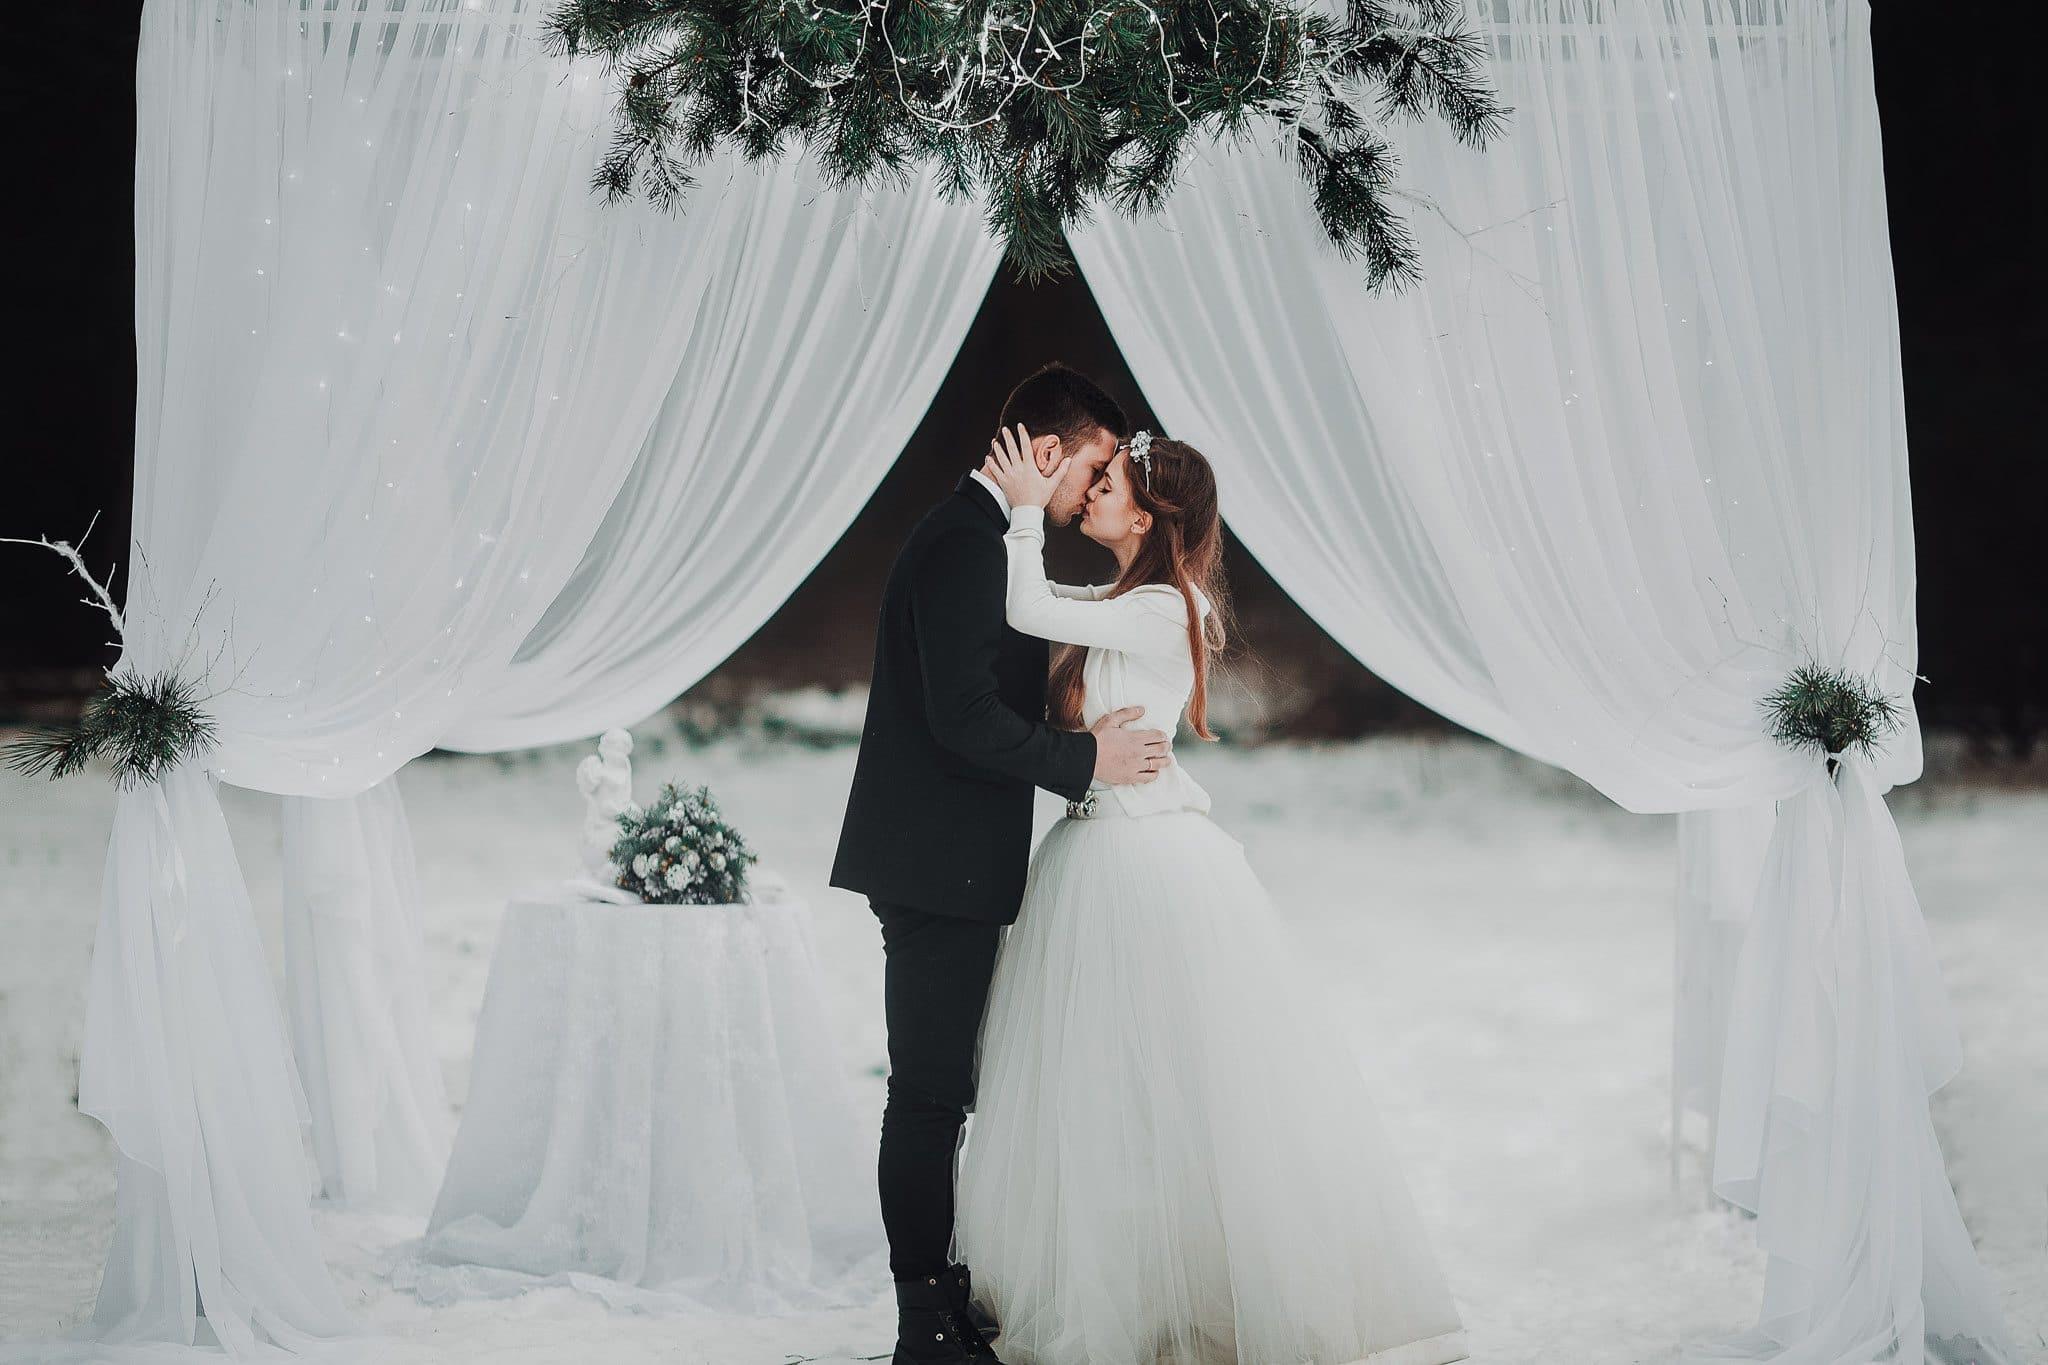 have a winter wedding, wedding photographer milton keynes